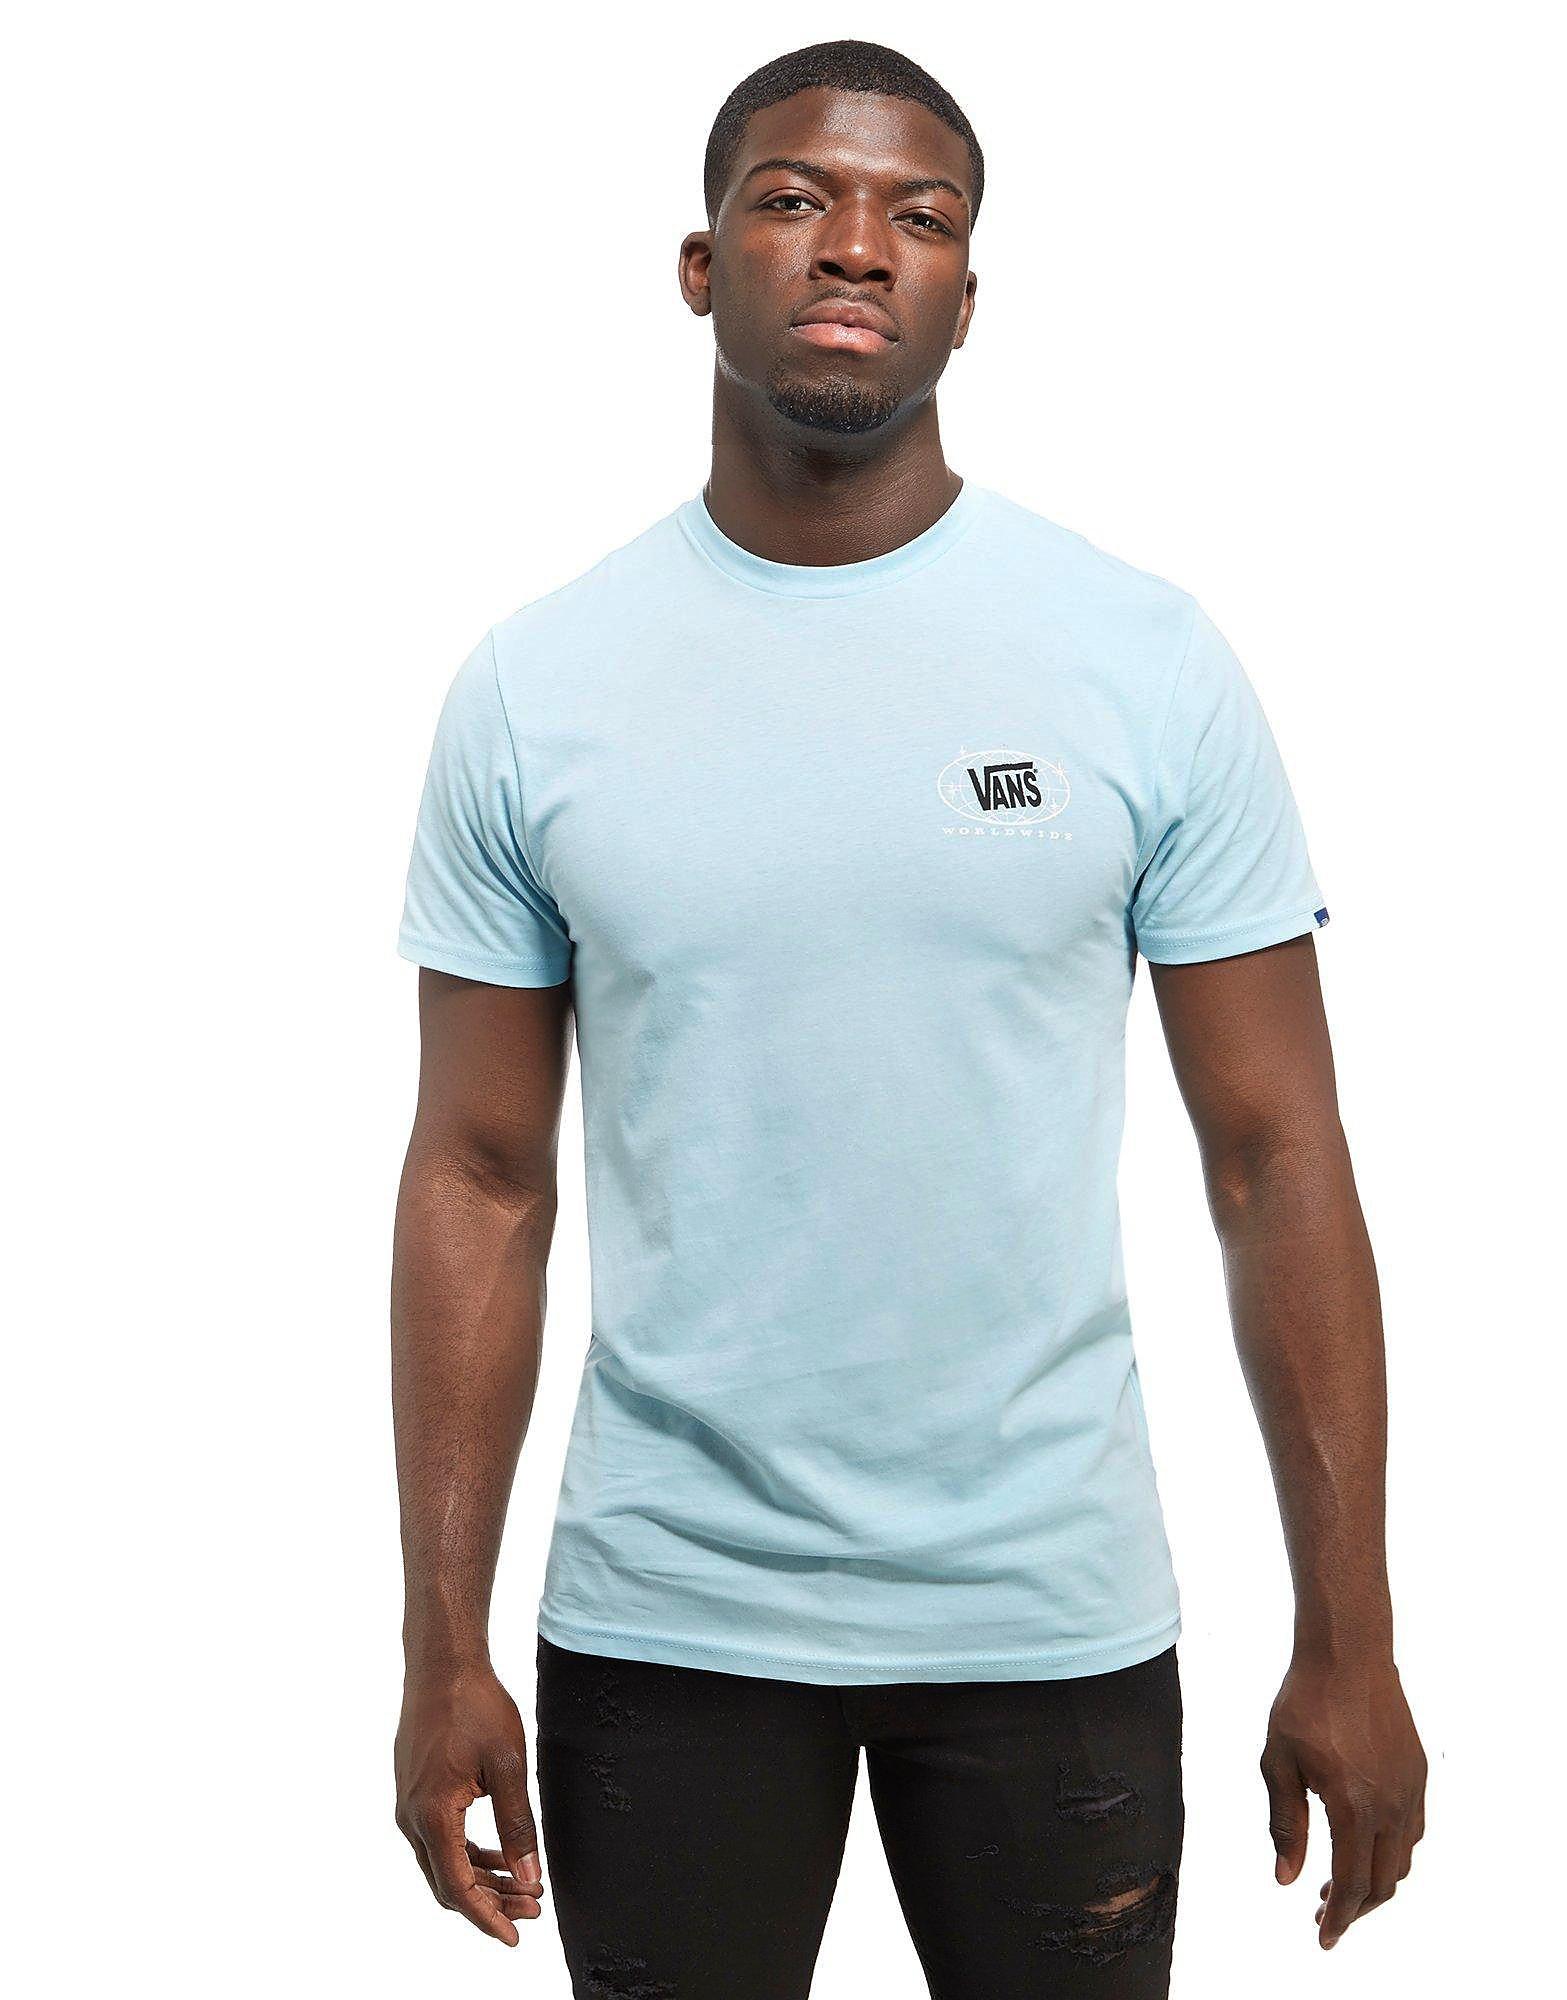 Vans Global T-Shirt